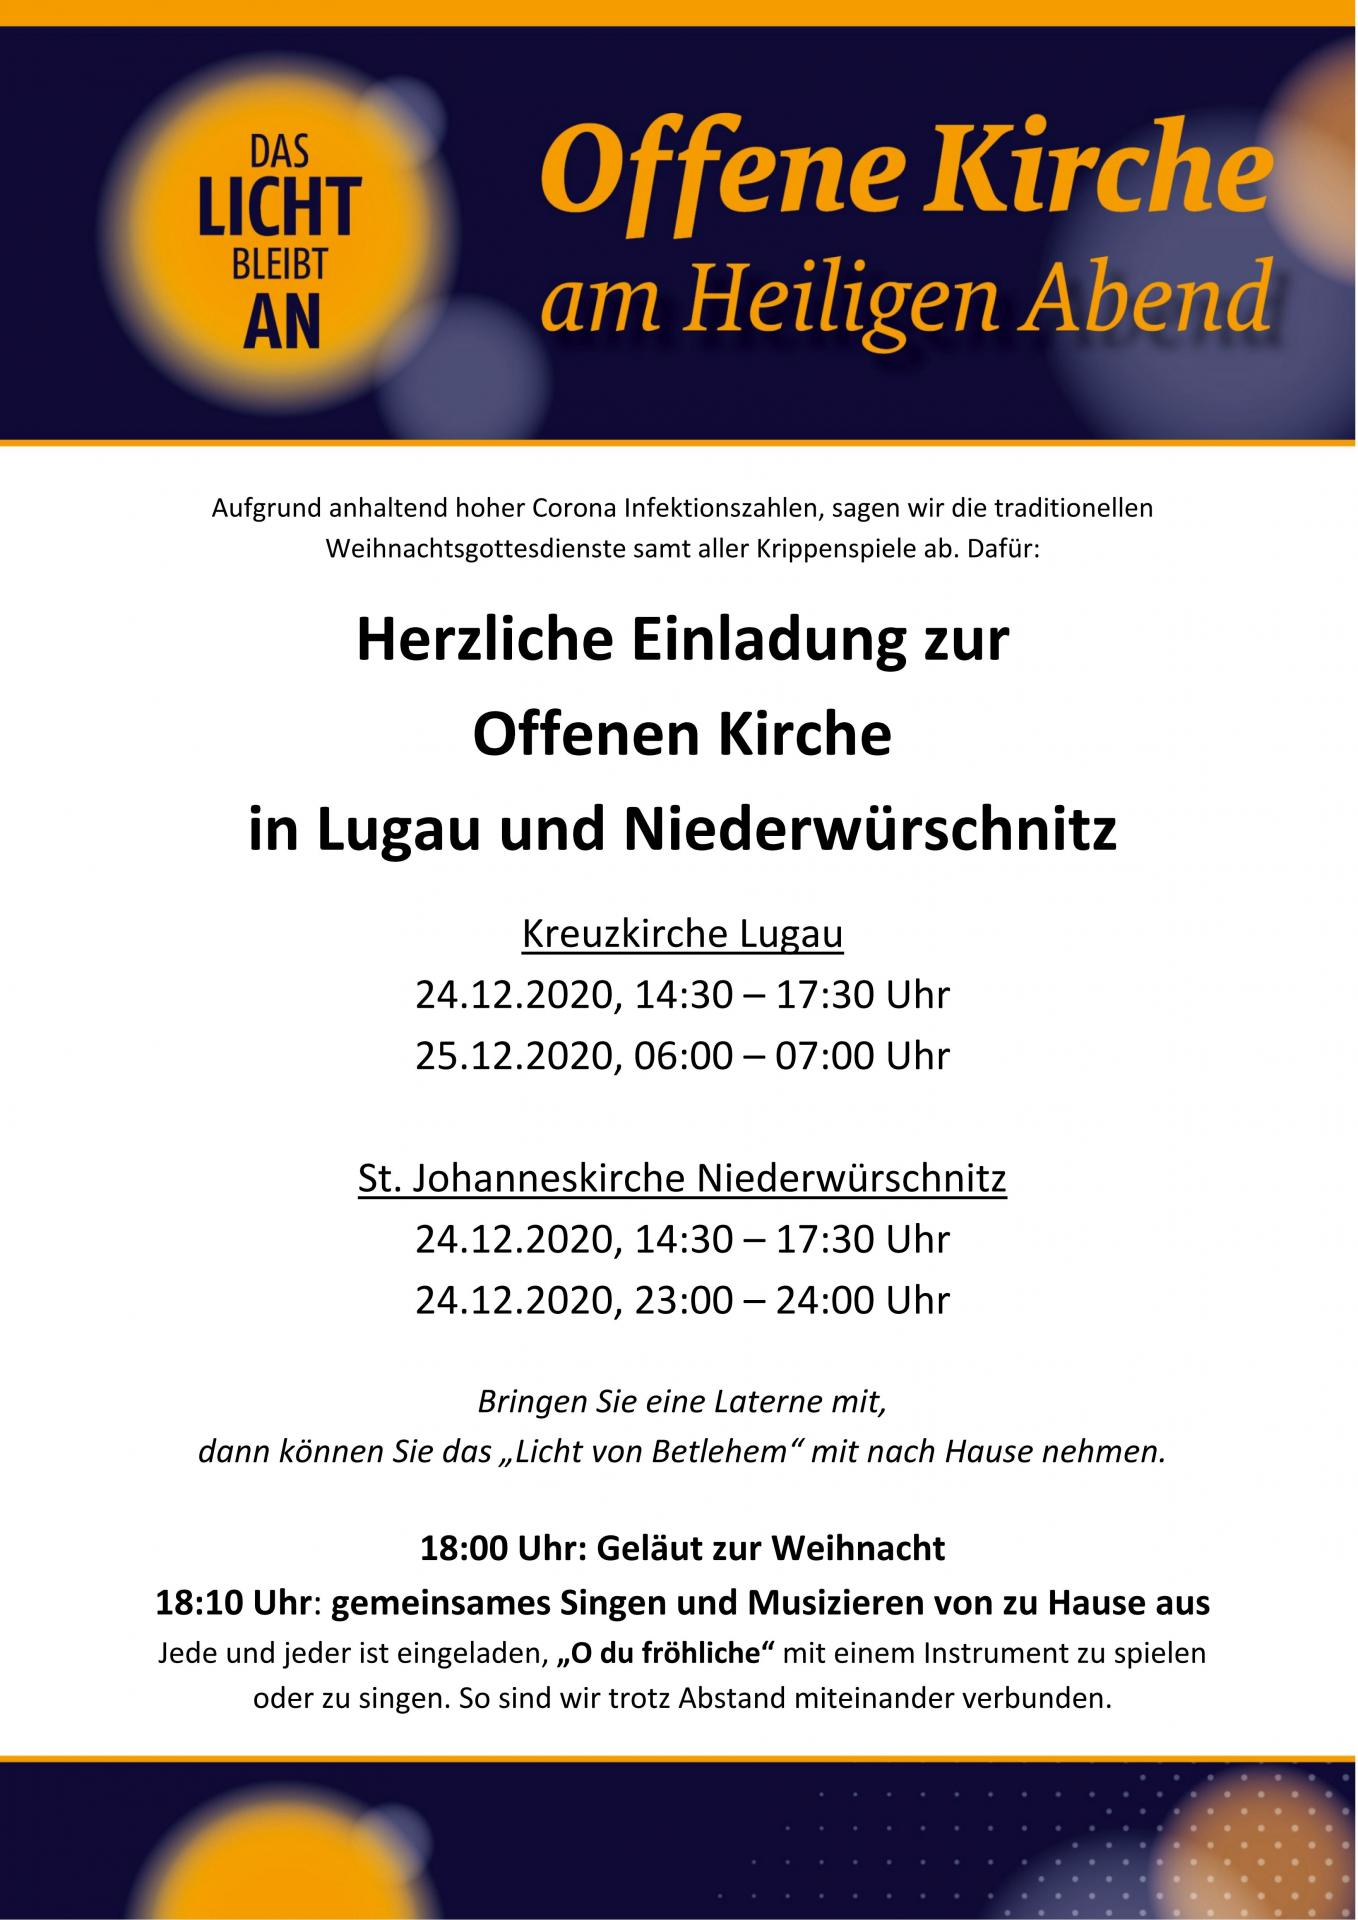 Lugau-Niederwürschnitz